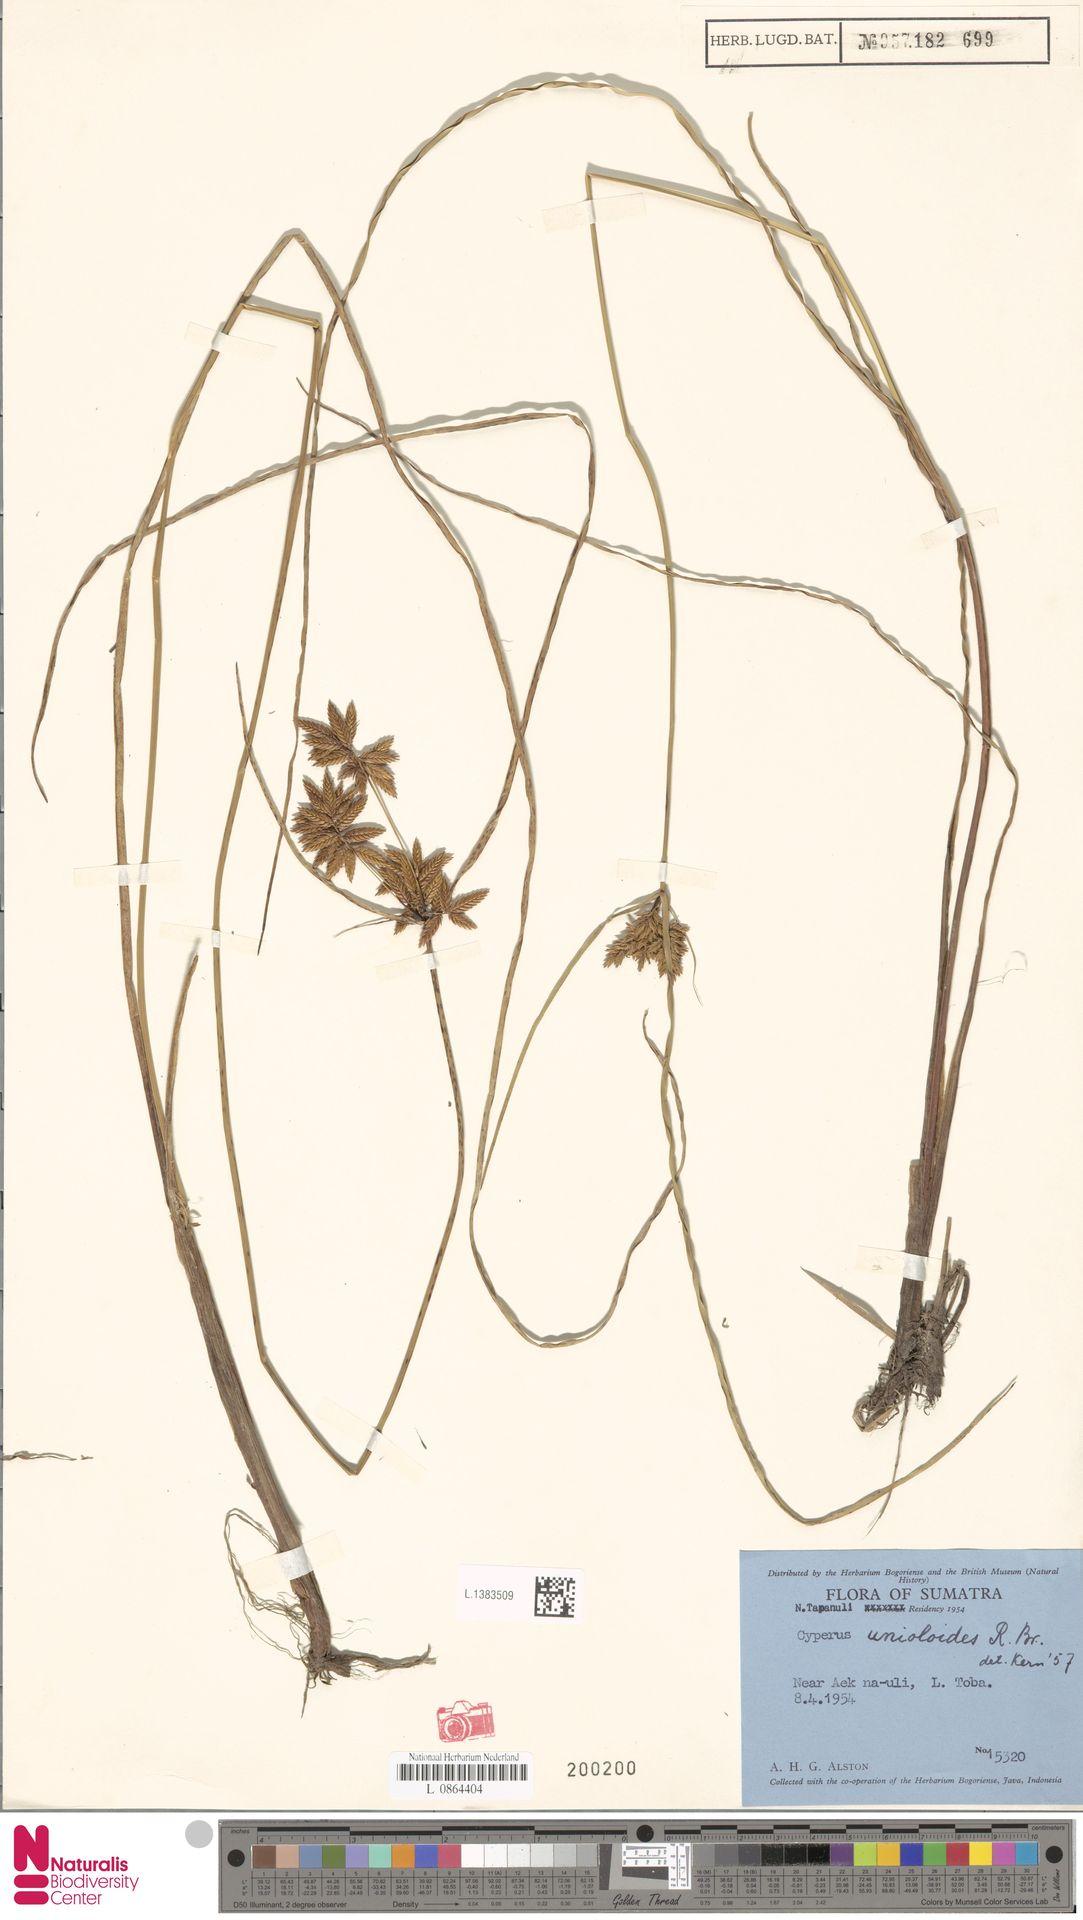 L.1383509 | Cyperus unioloides R.Br.